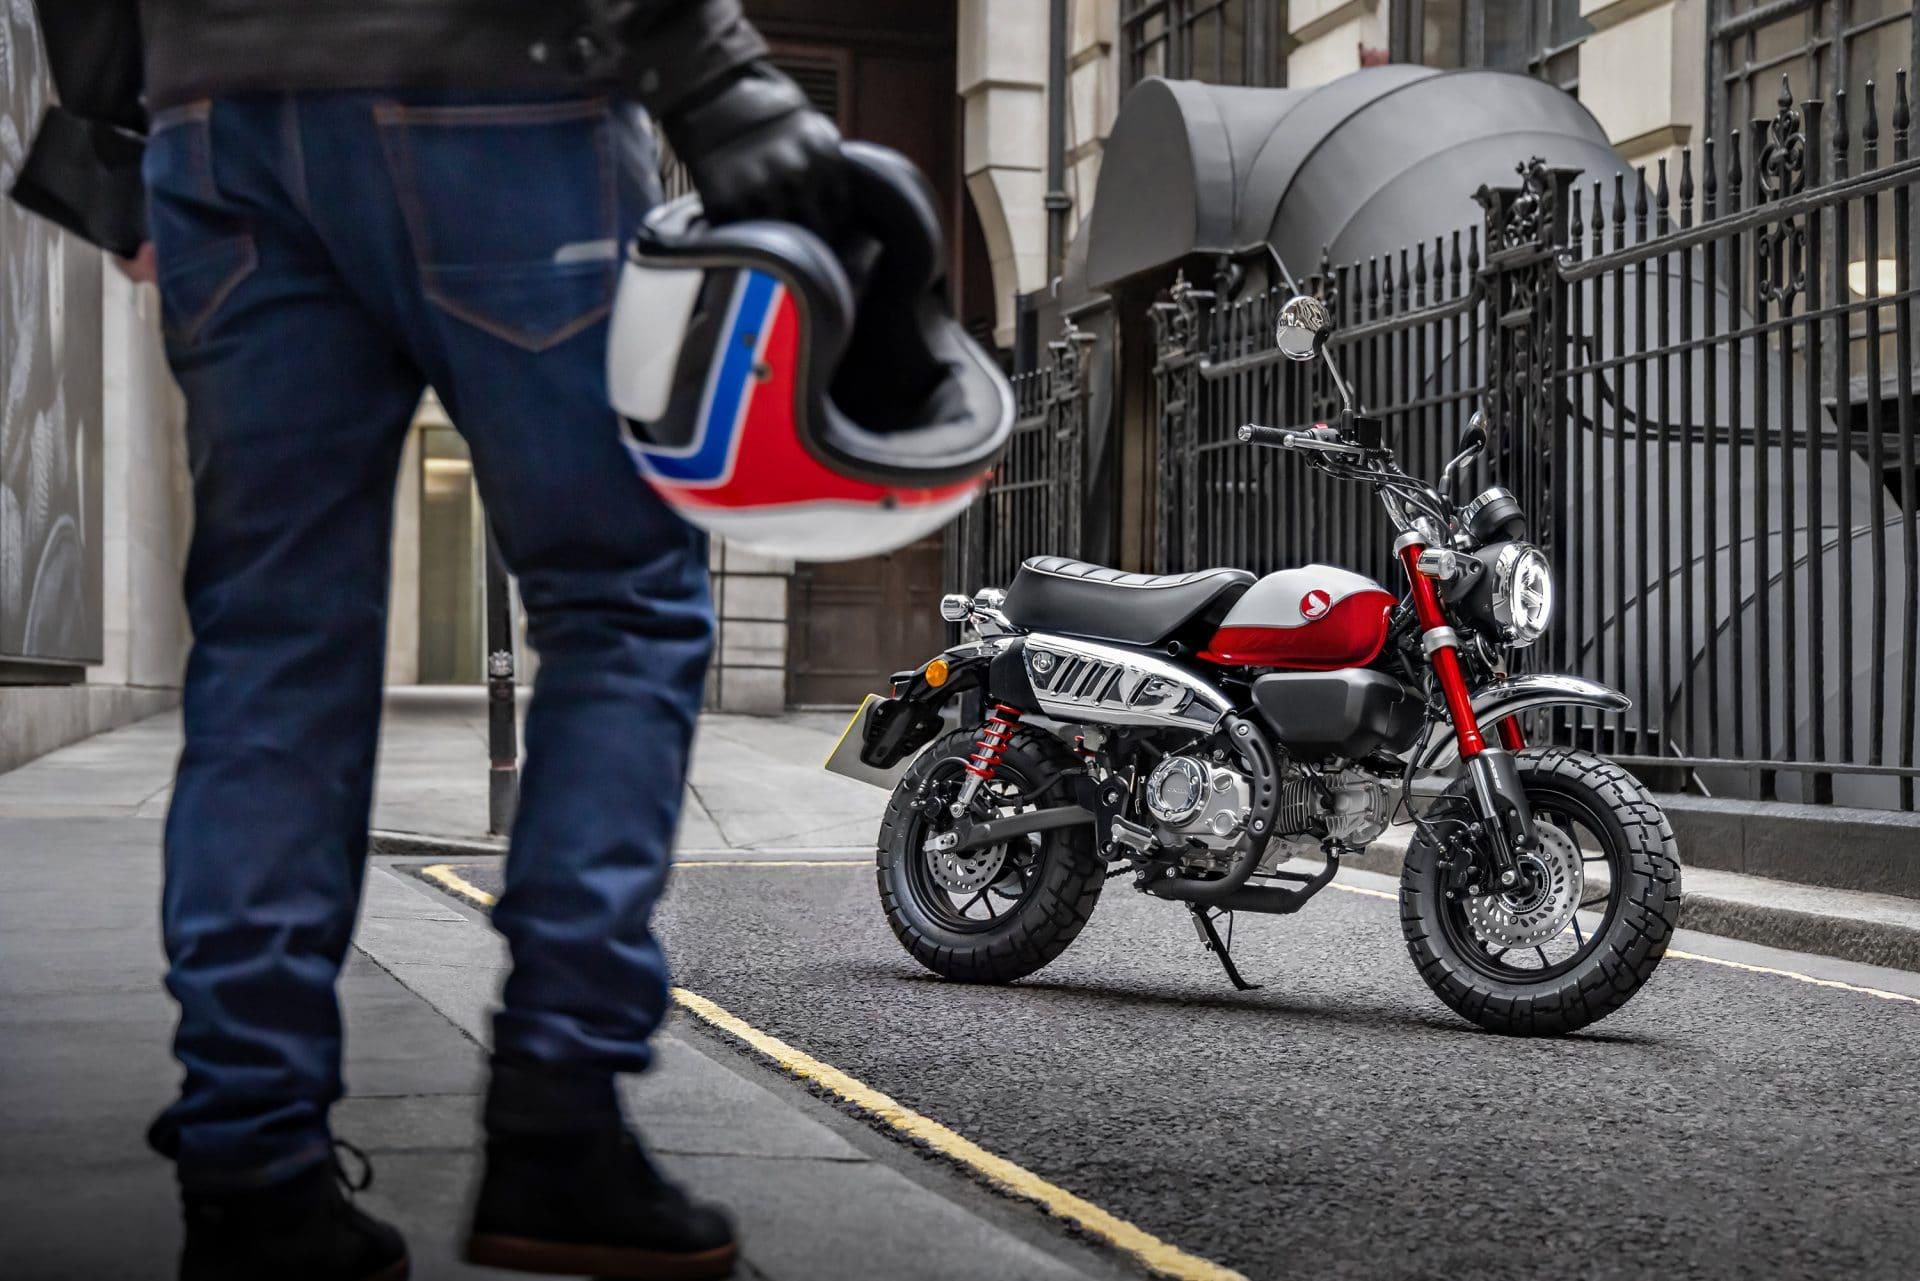 La Honda Monkey 2022 arrive au Canada ! Source : https://motorcycle.honda.ca/model/minimoto_fr/monkey/2022